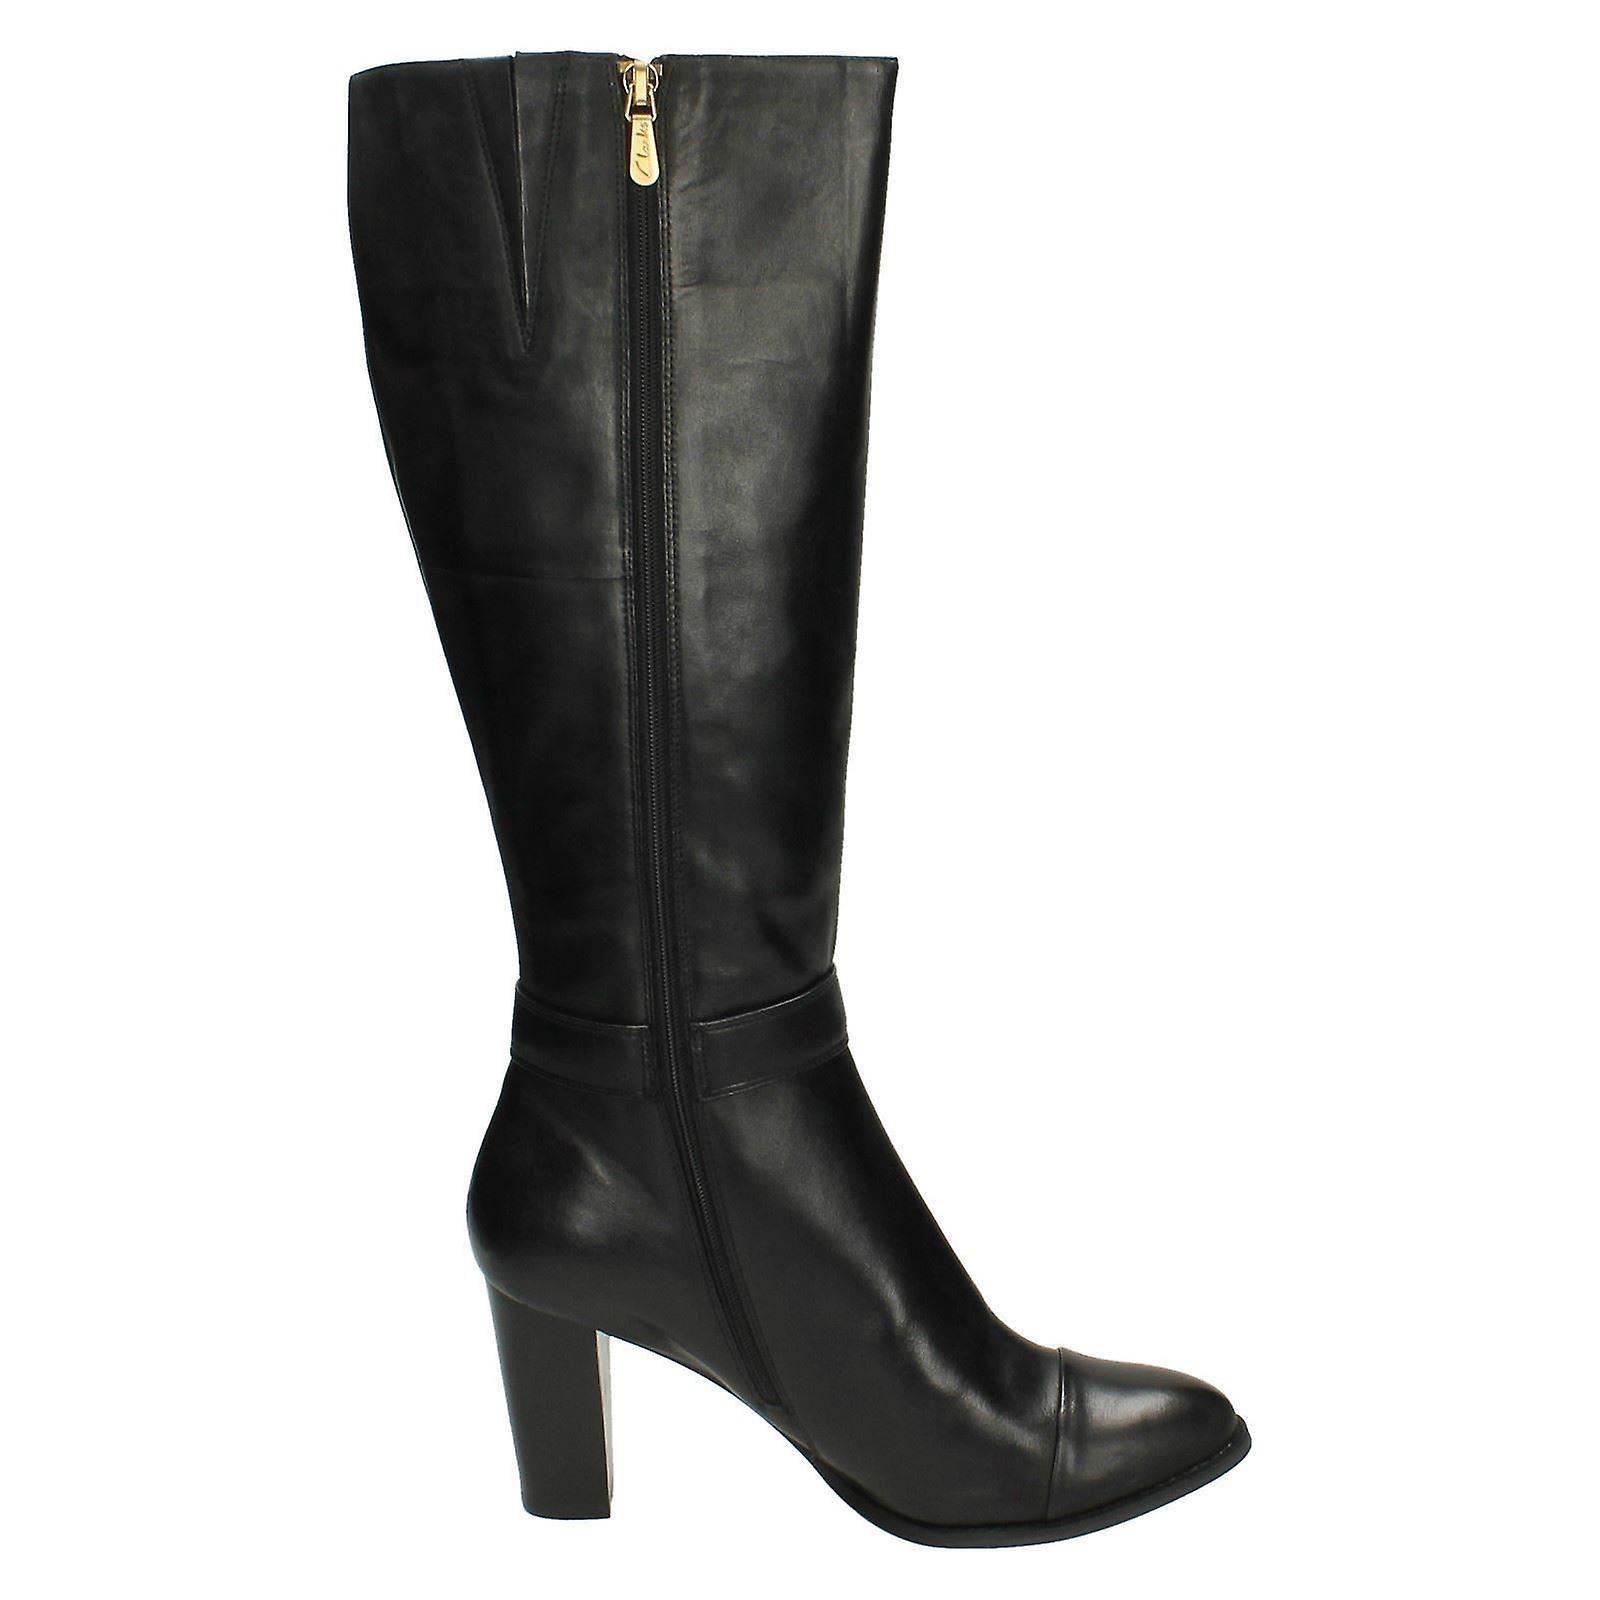 Ladies Clarks Leather Knee High Boots 'lorin Alfresco' Black Uk 7d, Eu 41